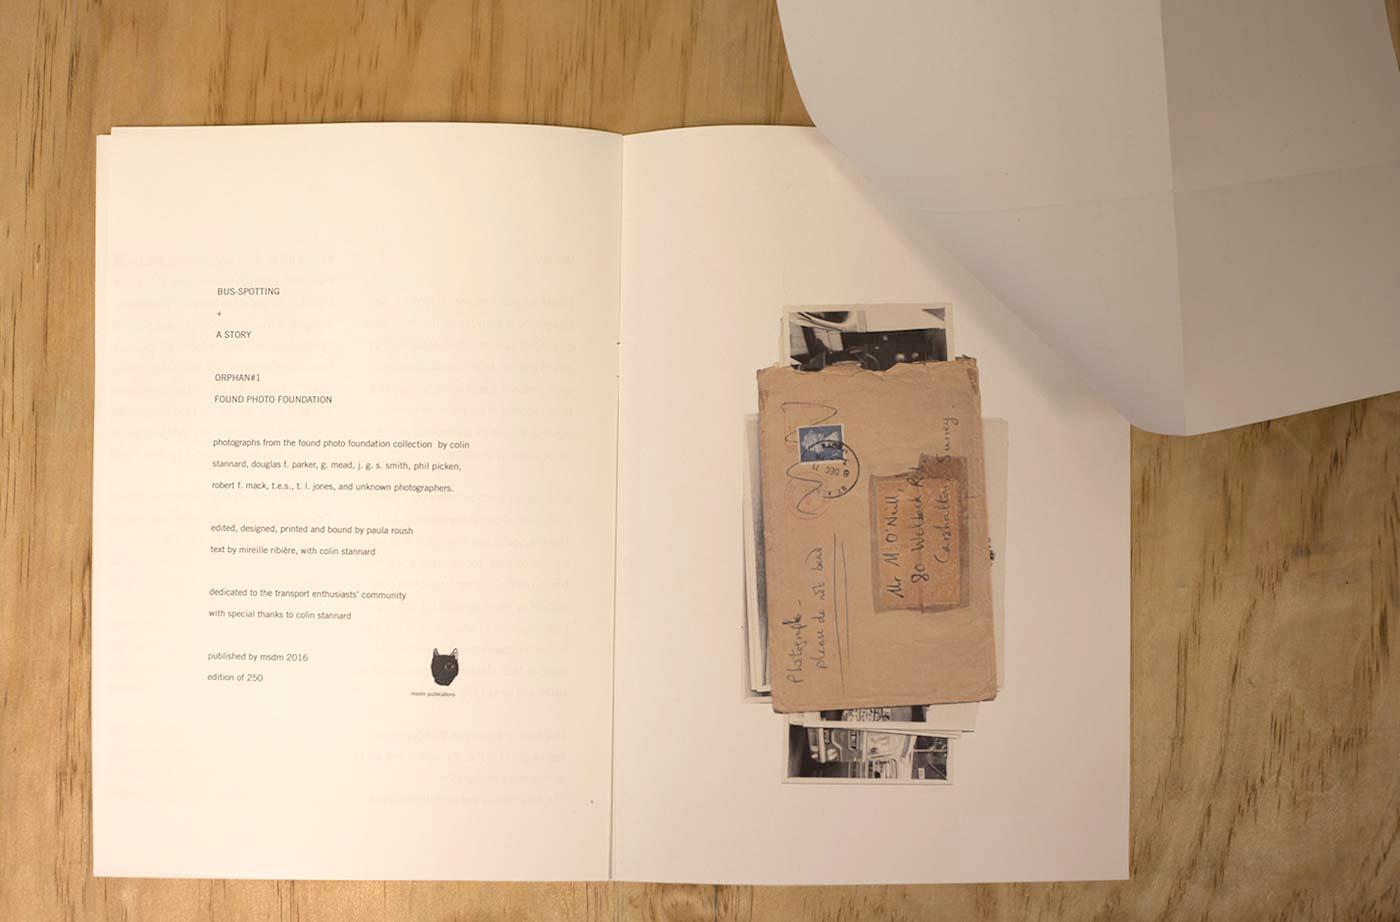 paula-roush-bus-spotting-photobook-msdm-publications-orphan1-150